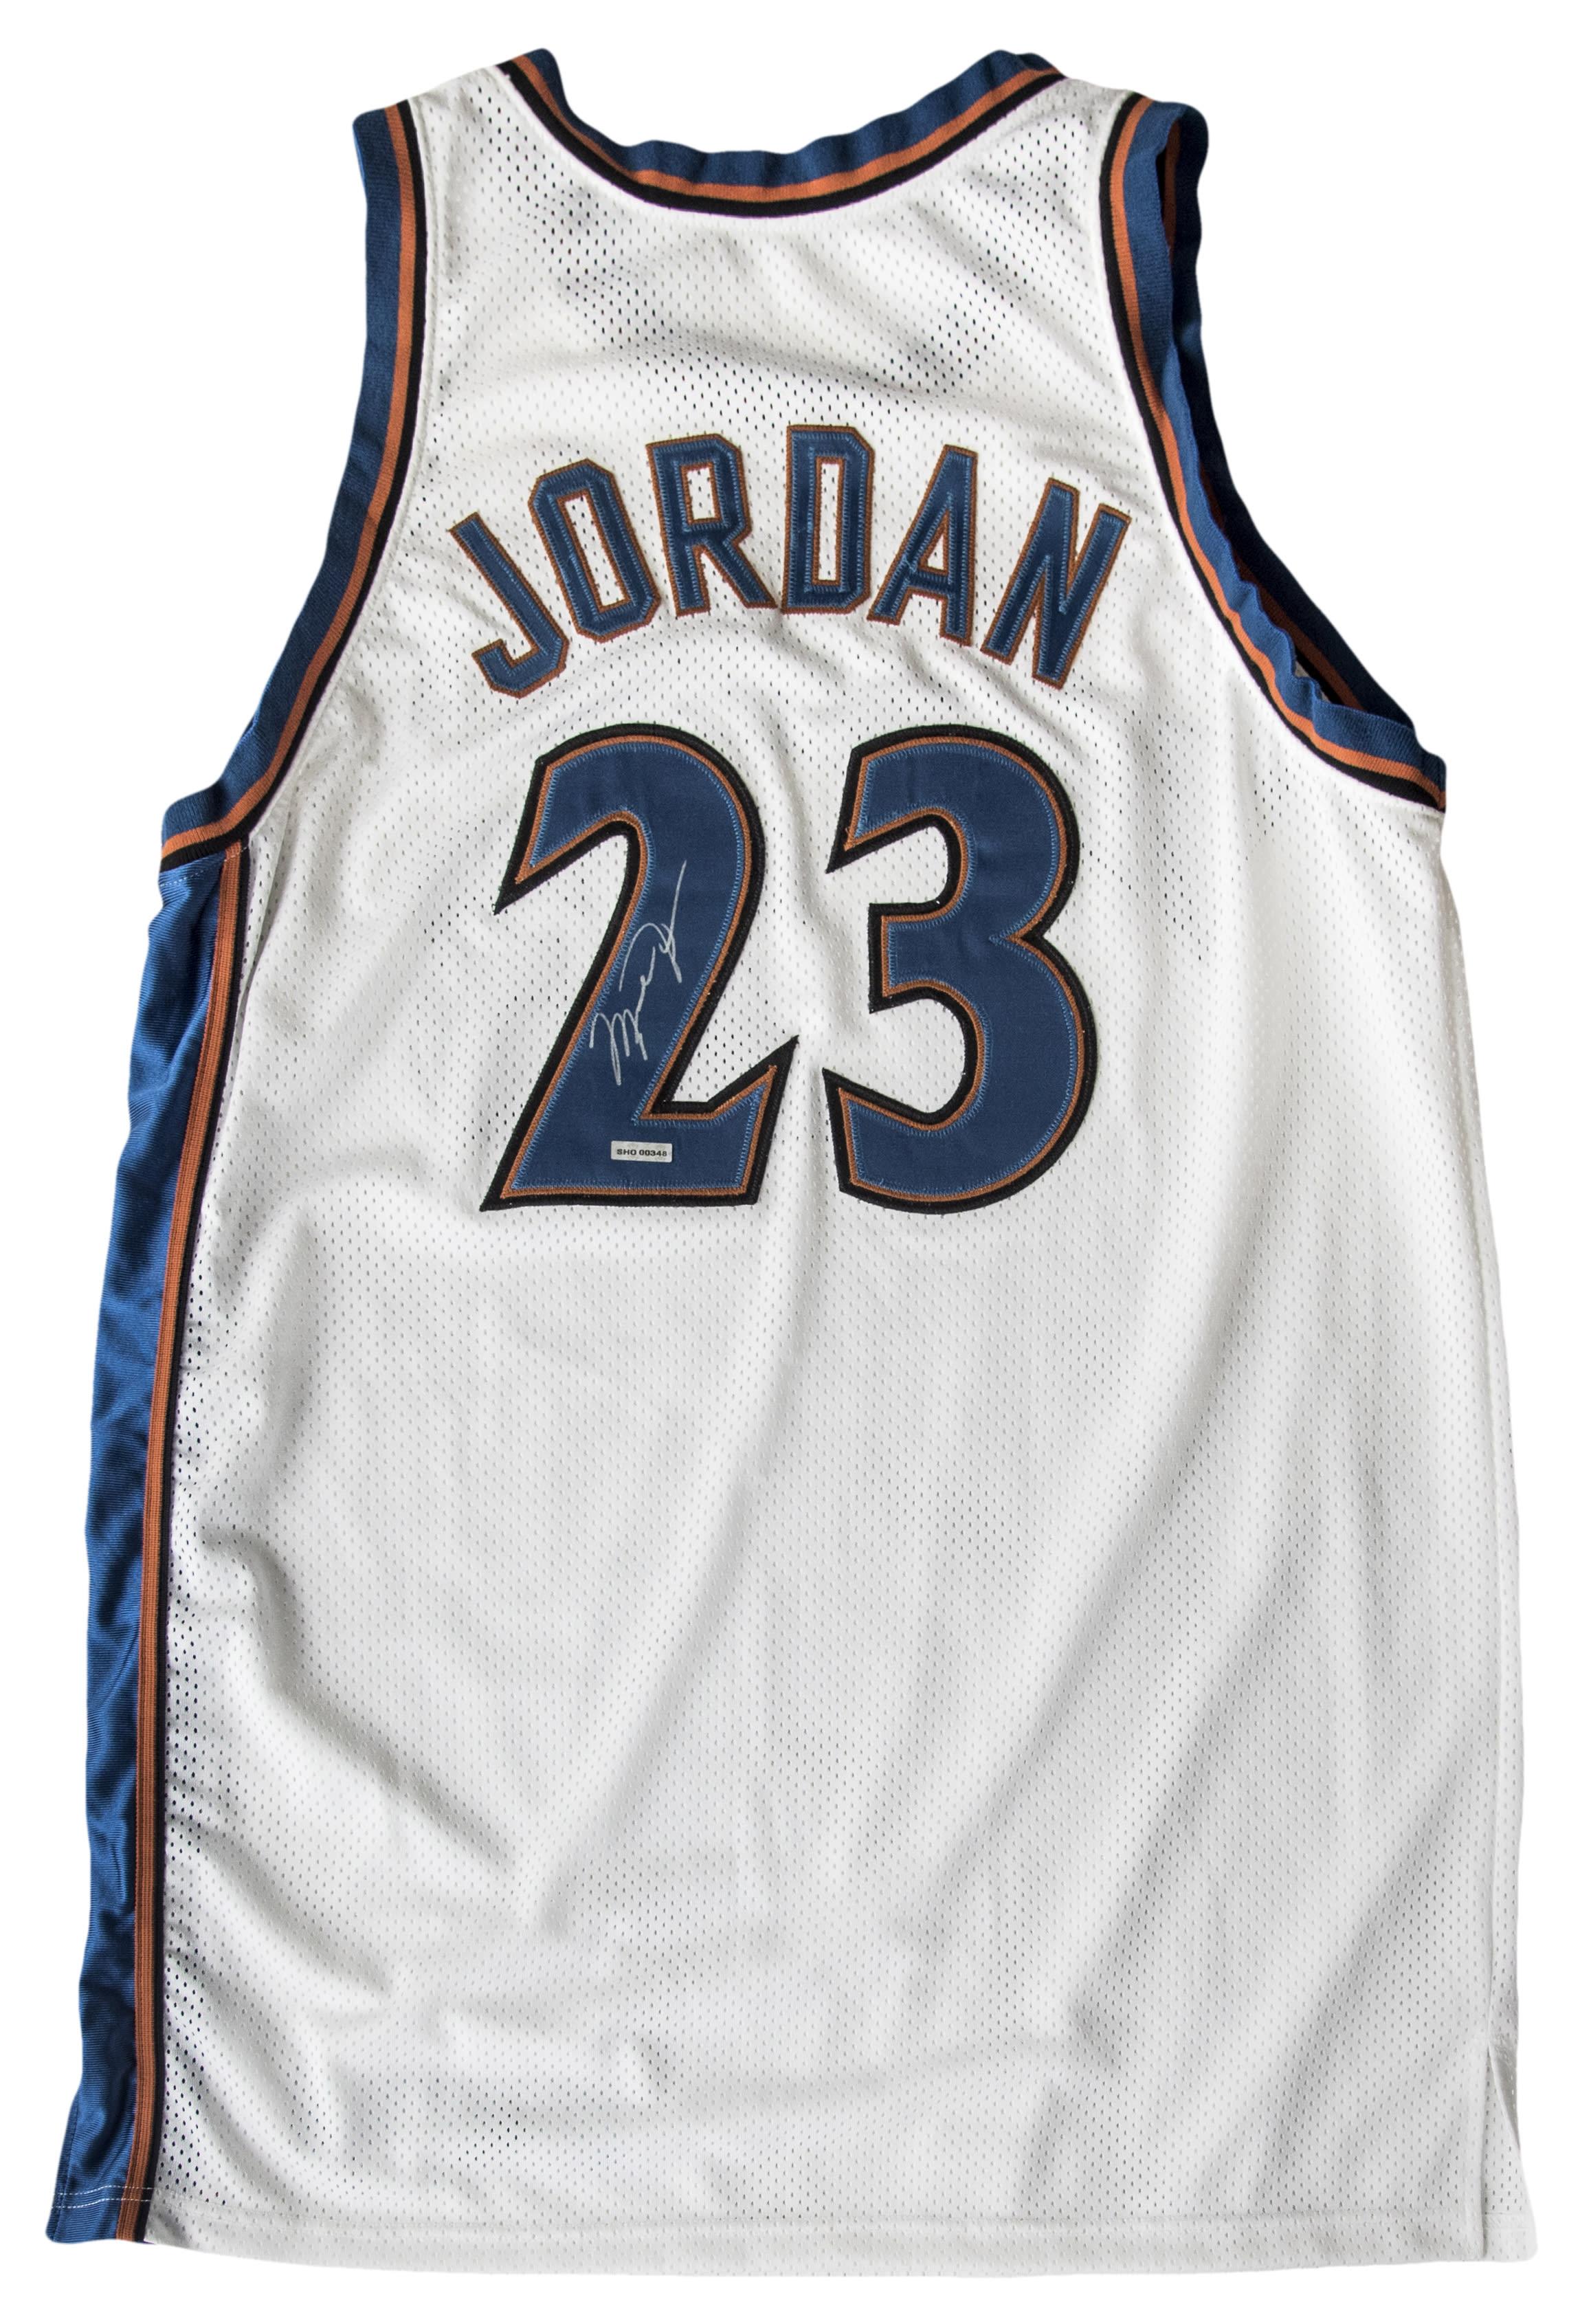 Michael Jordan Washington Wizards Jersey (Back)